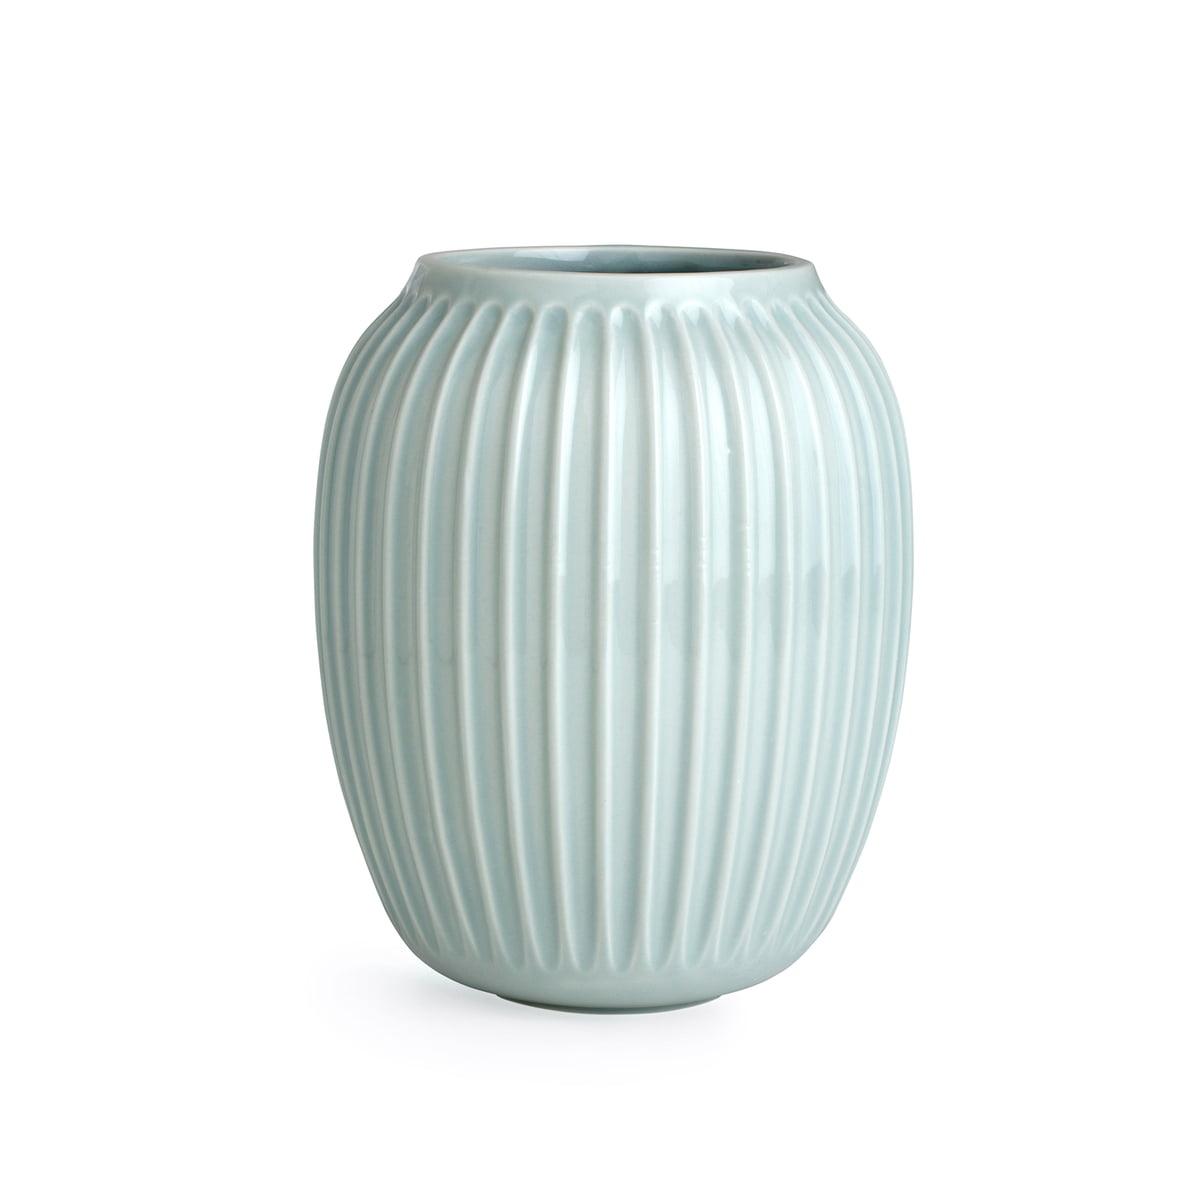 Kaehler design hammershoi vase h 20 cm mint frei